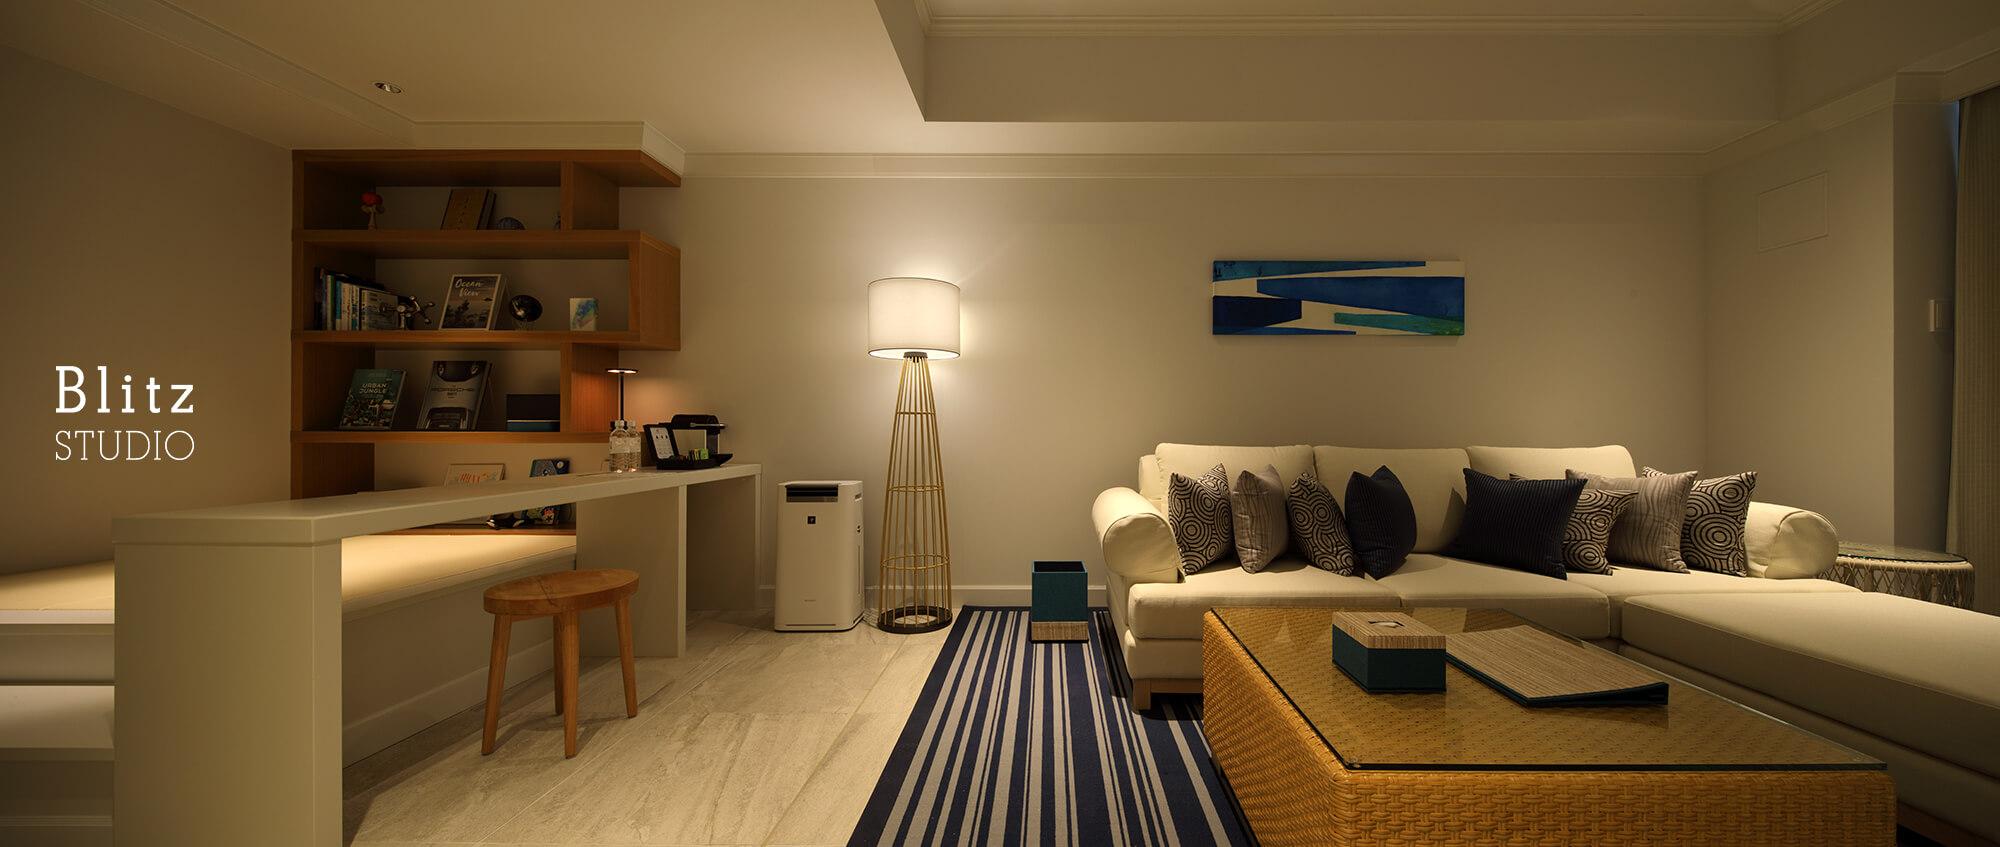 『HOTEL SHIGIRA MIRAGE BAYSIDE』建築写真・竣工写真・インテリア写真21